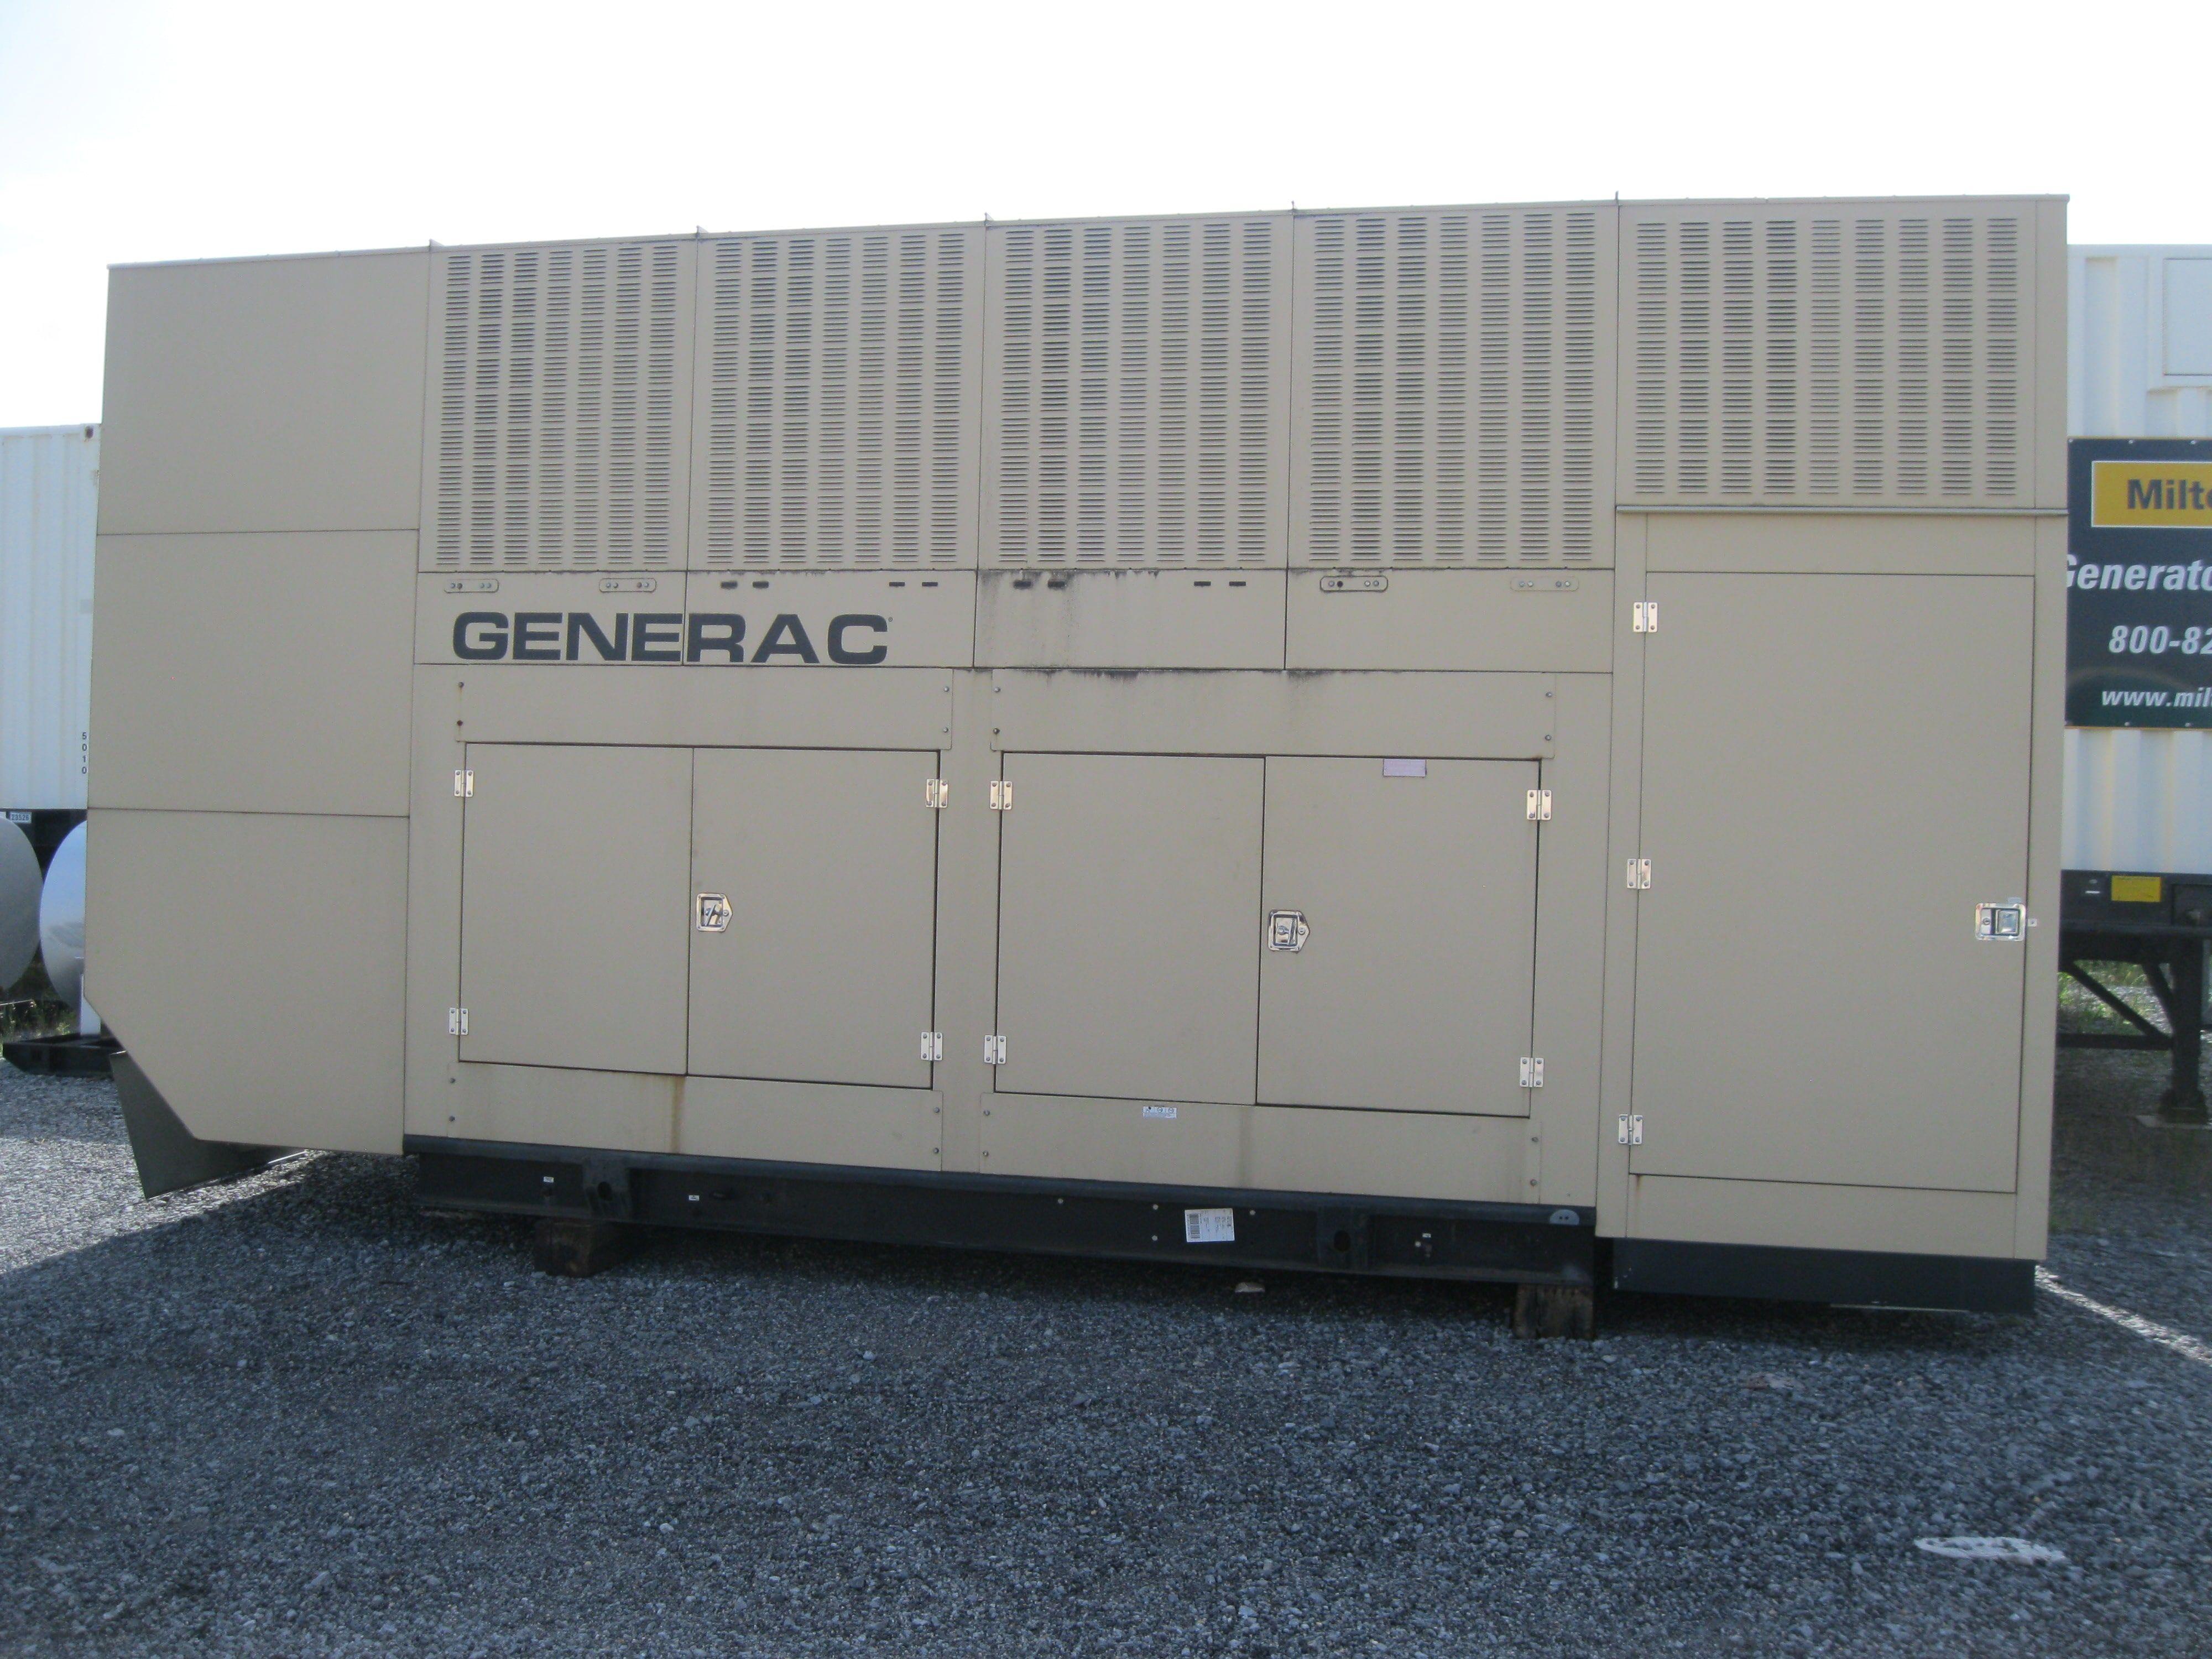 1000 Kw Generac Diesel Generator Tier 2 Rated 2750 Gallon Base Tank Woodstock Power Company Diesel Generators Locker Storage Generation